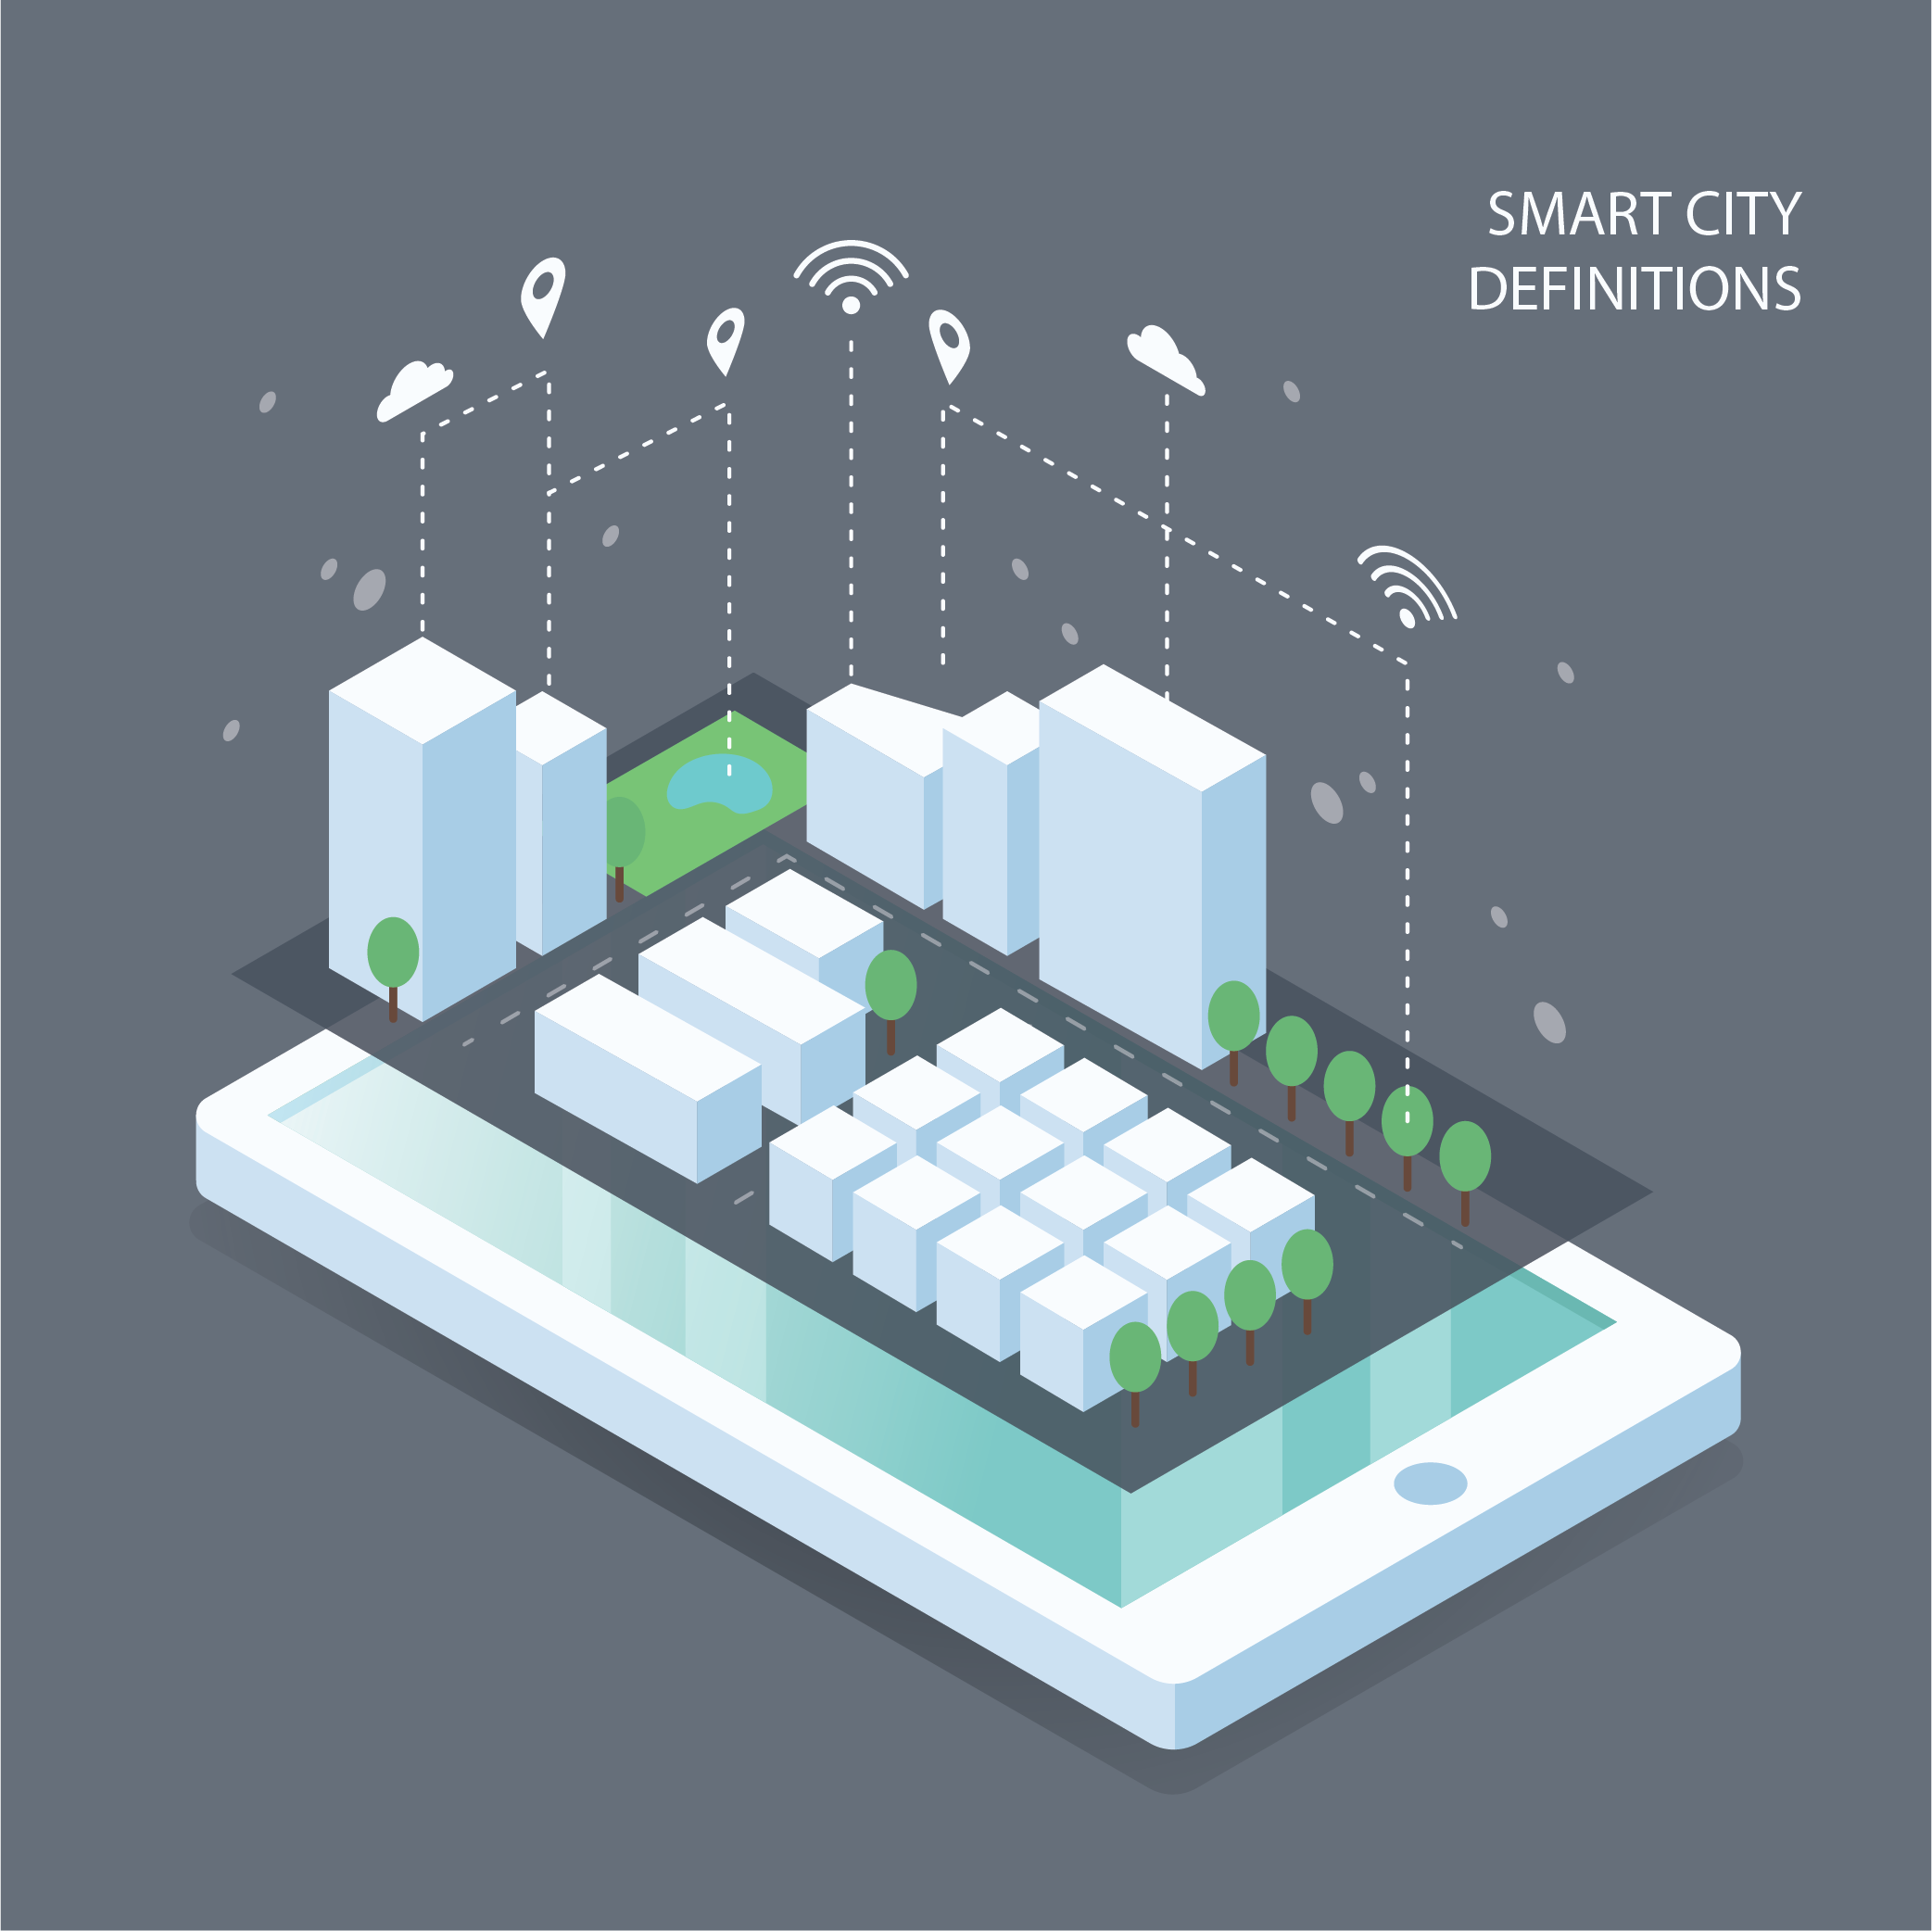 smart city definitions